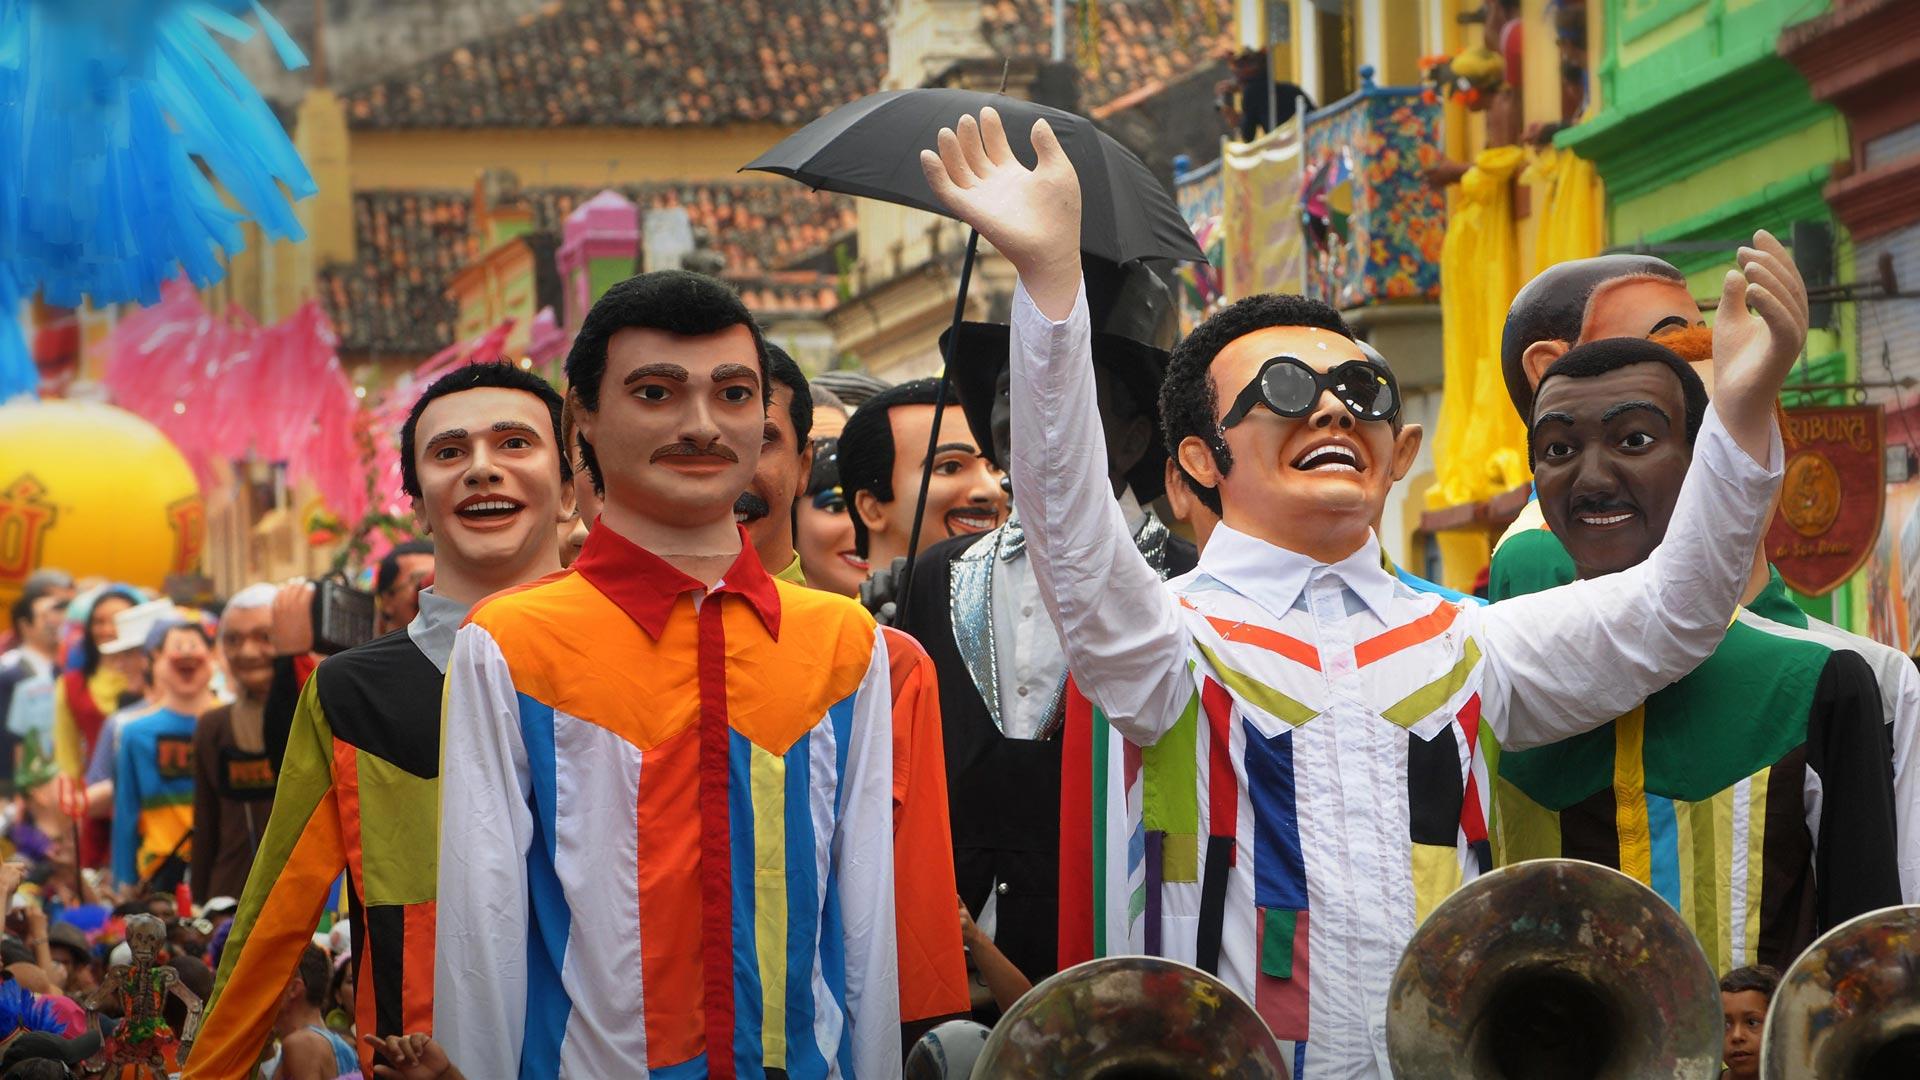 Marionnettes géantes au carnaval d'Olinda, Brésil (© Pulsar Imagens/Alamy)(Bing France)